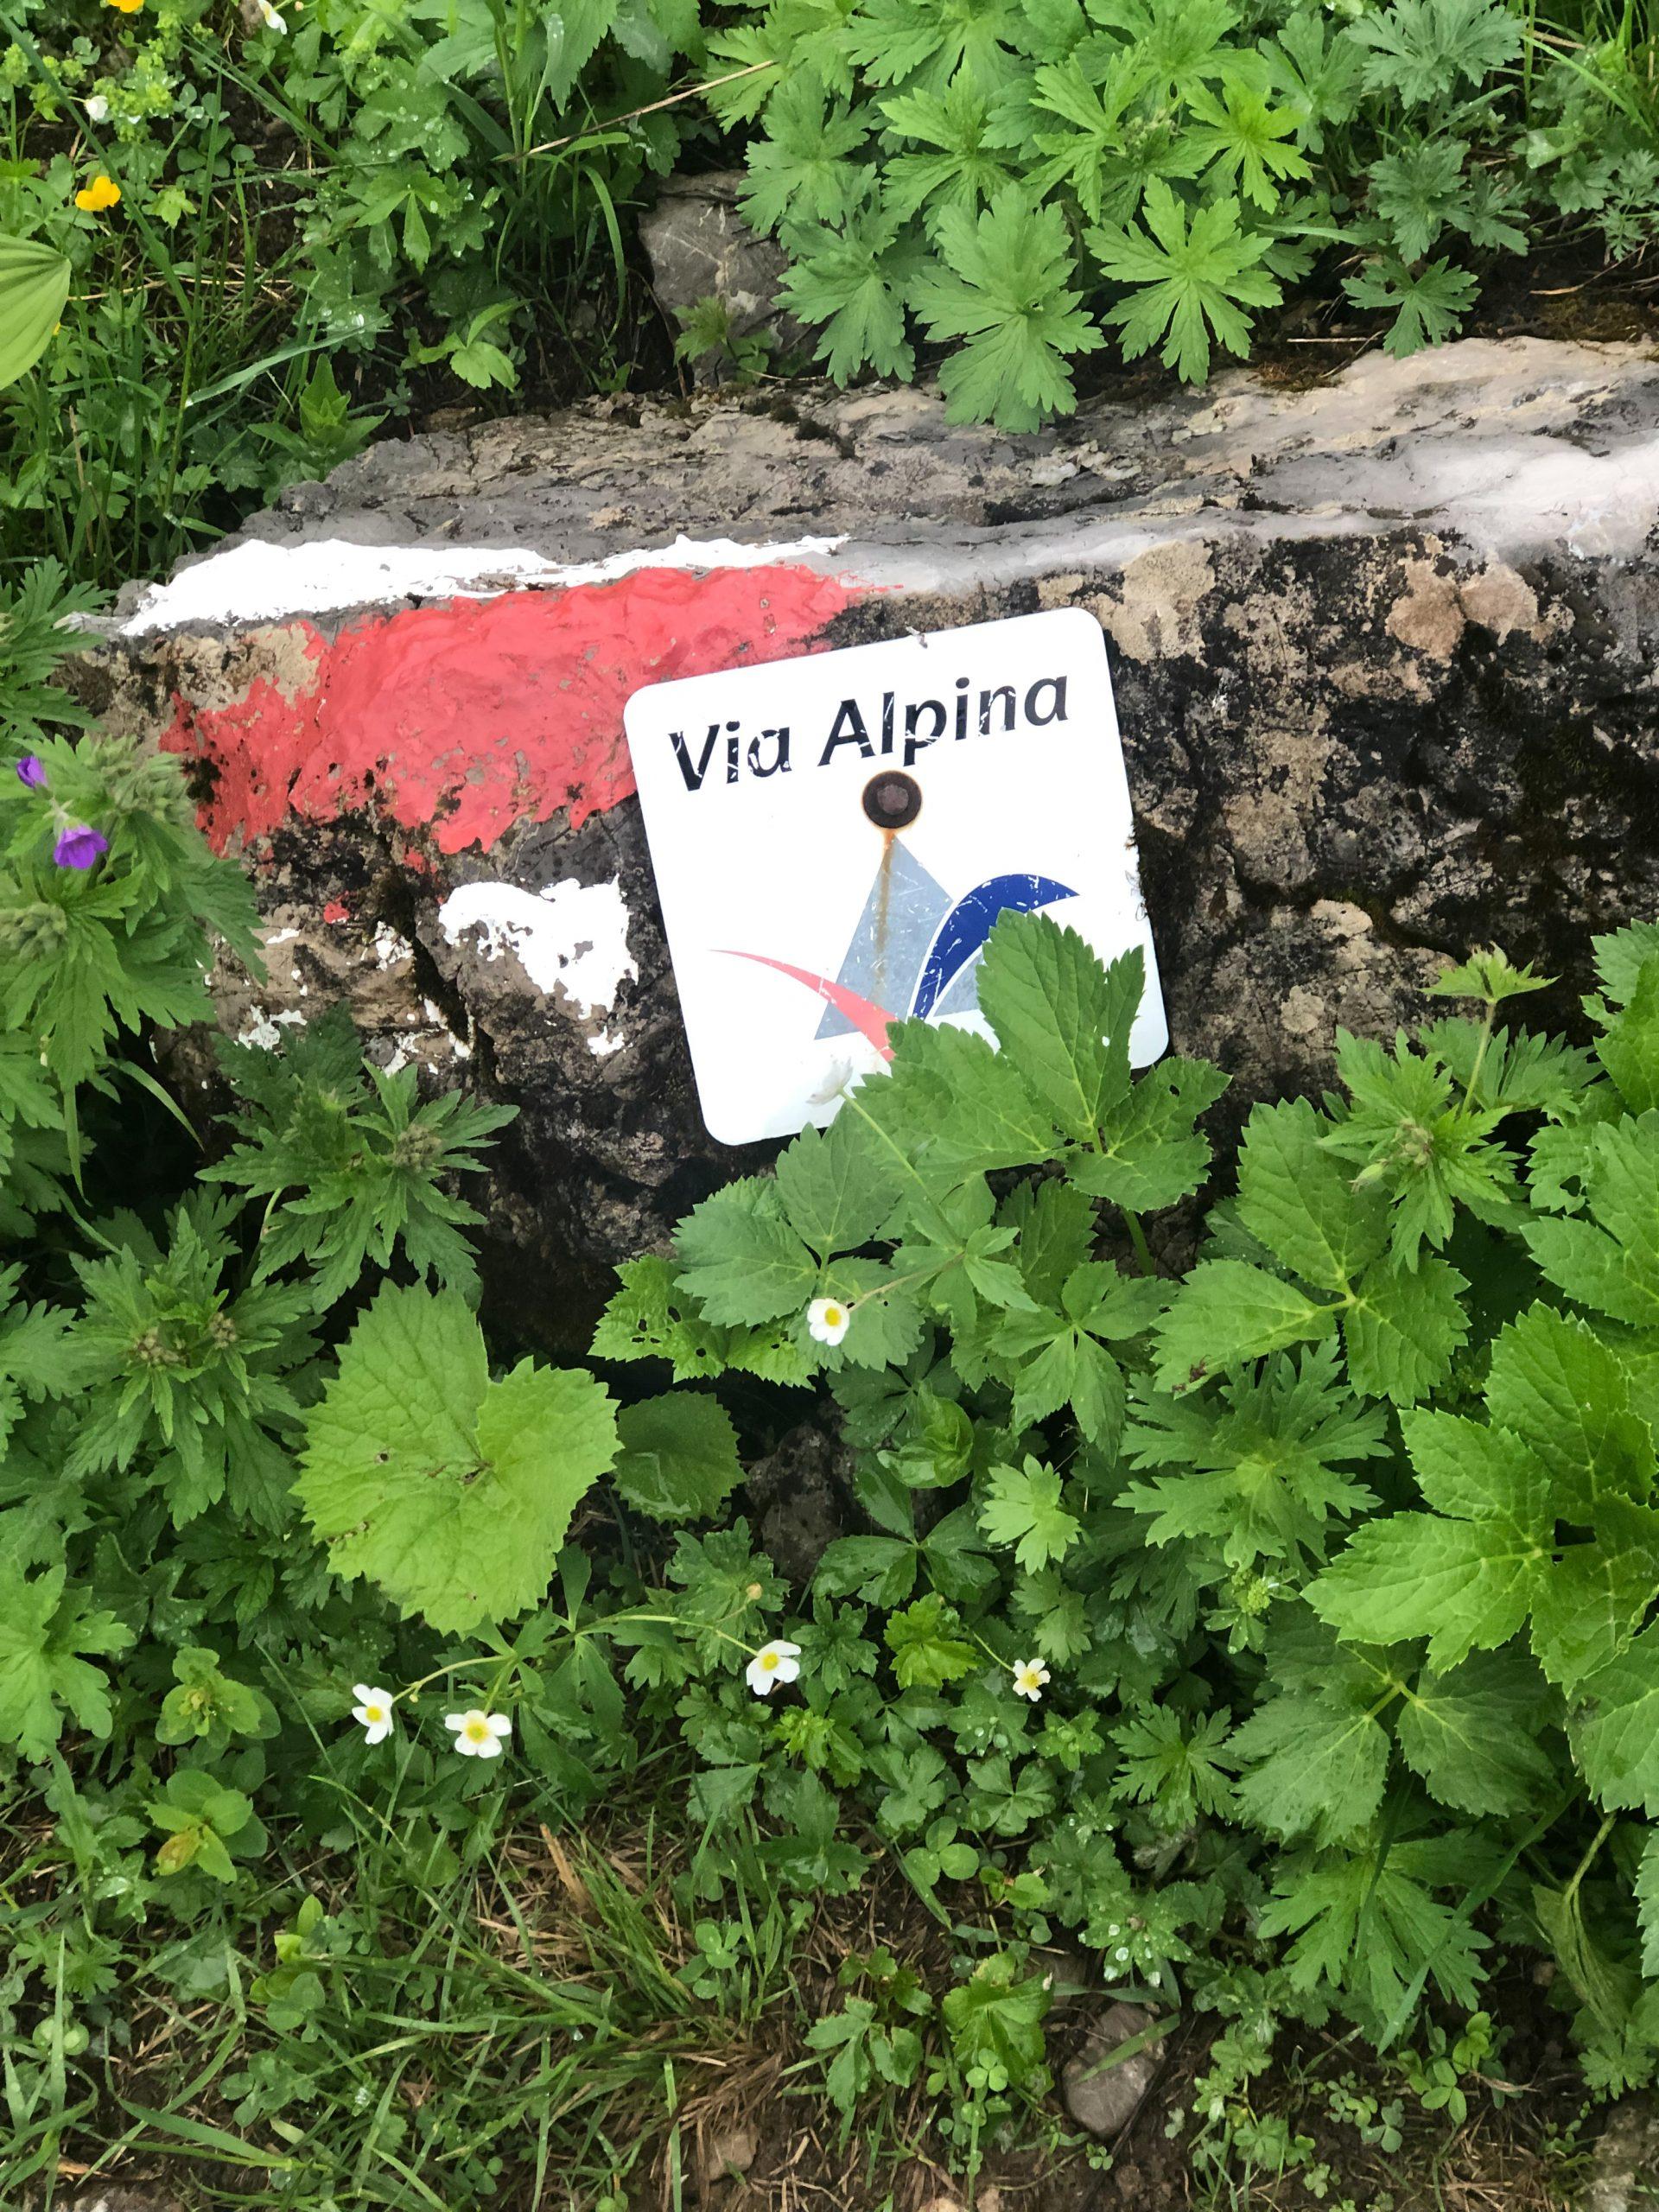 Borne de balisage de la Via Alpina dans les Alpes d'Allgäu en Bavière